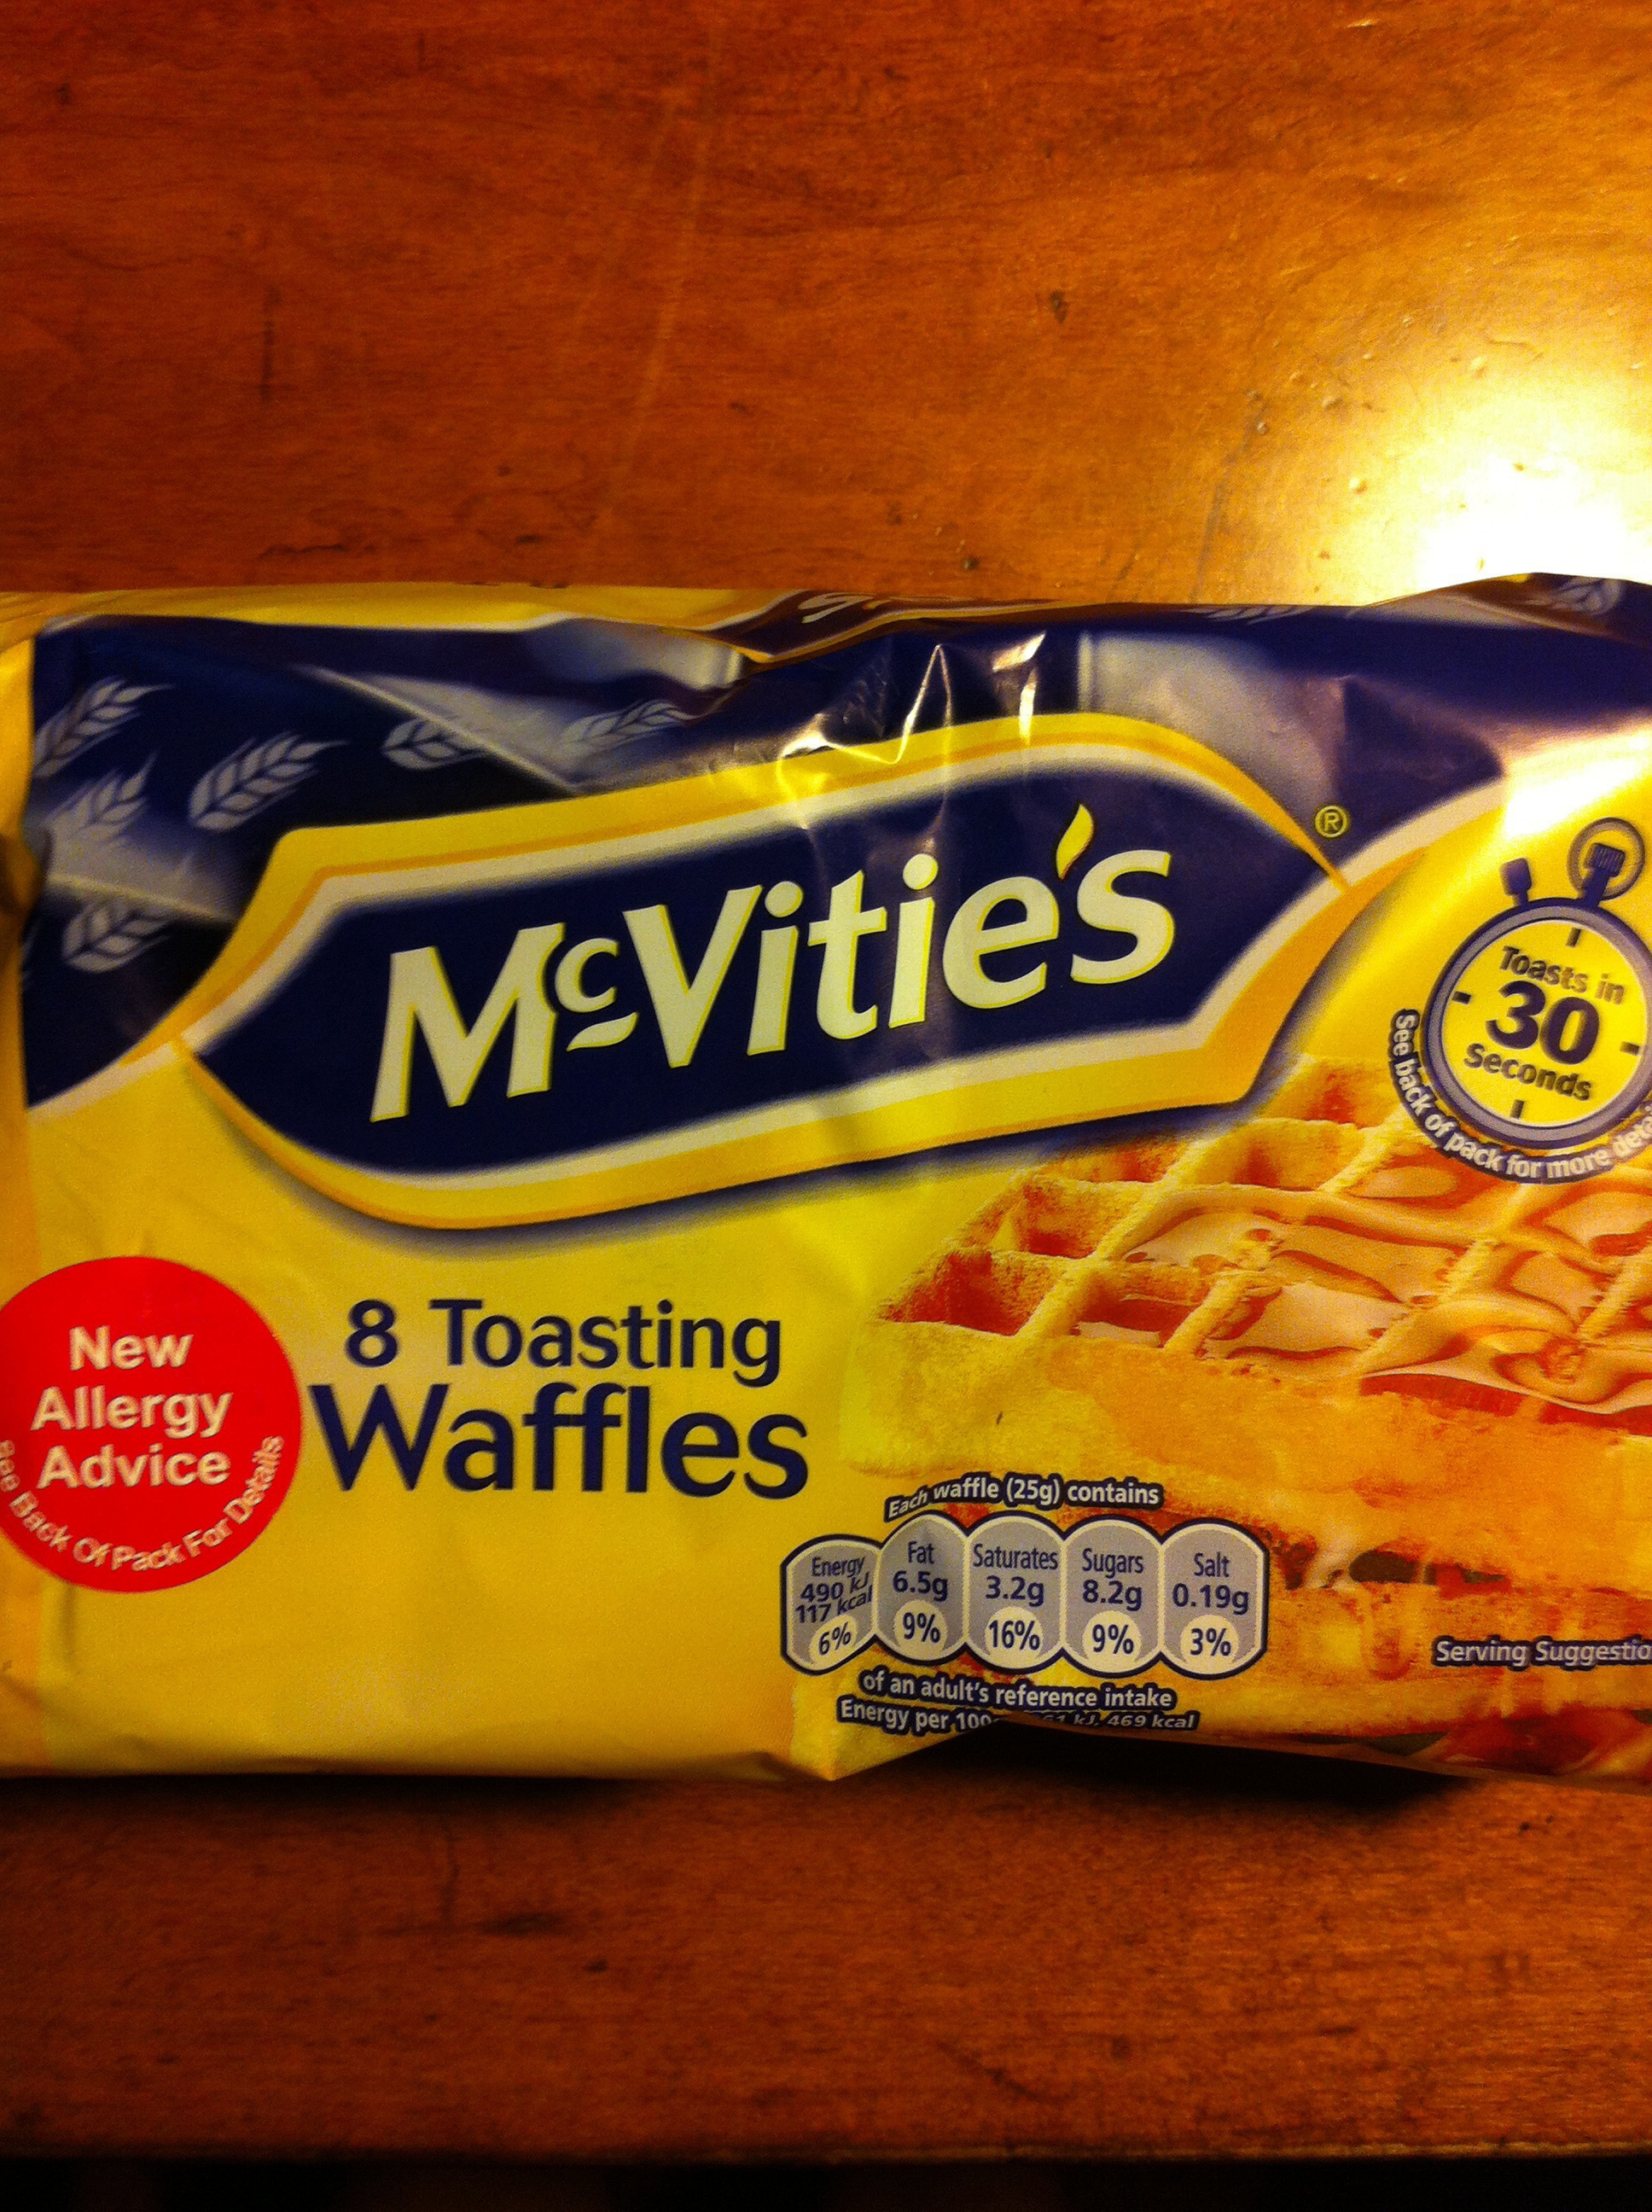 McVitie's Waffles